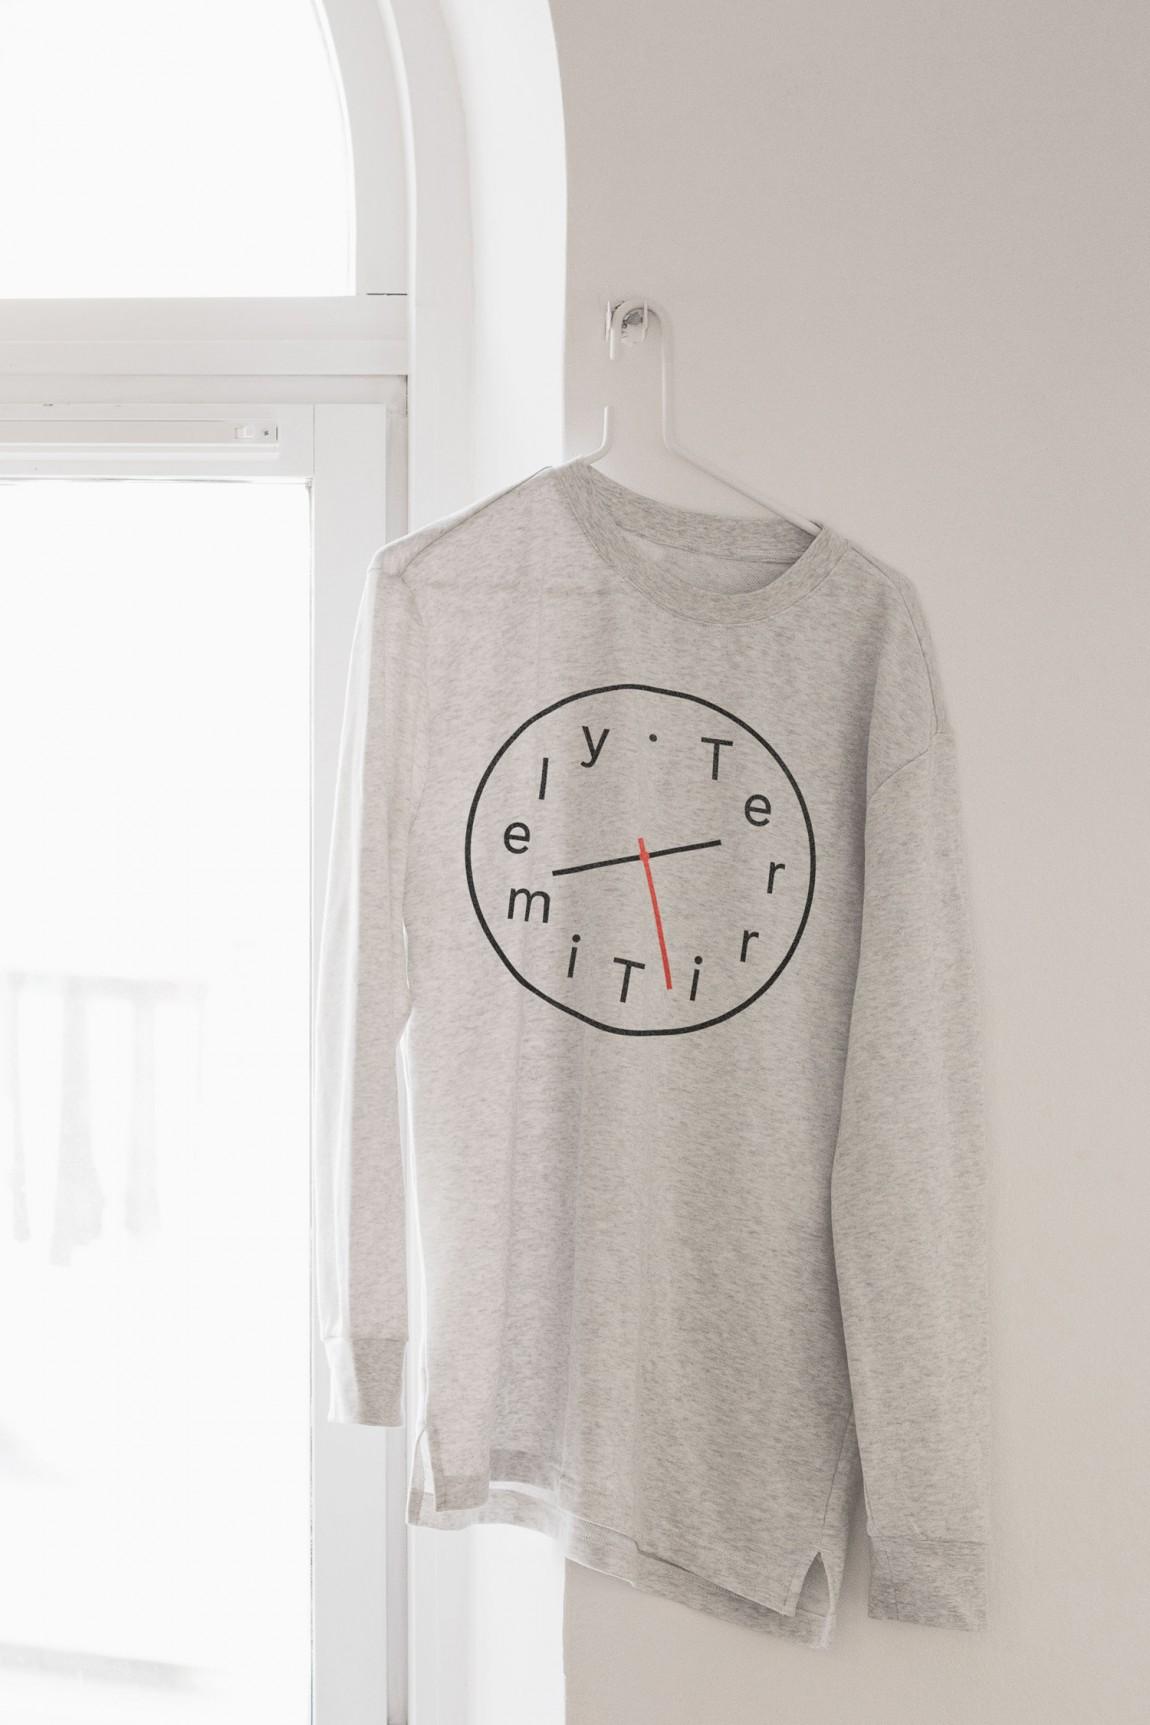 Terri Timely影视公司品牌形象识别系统VIS设计,T恤衫设计